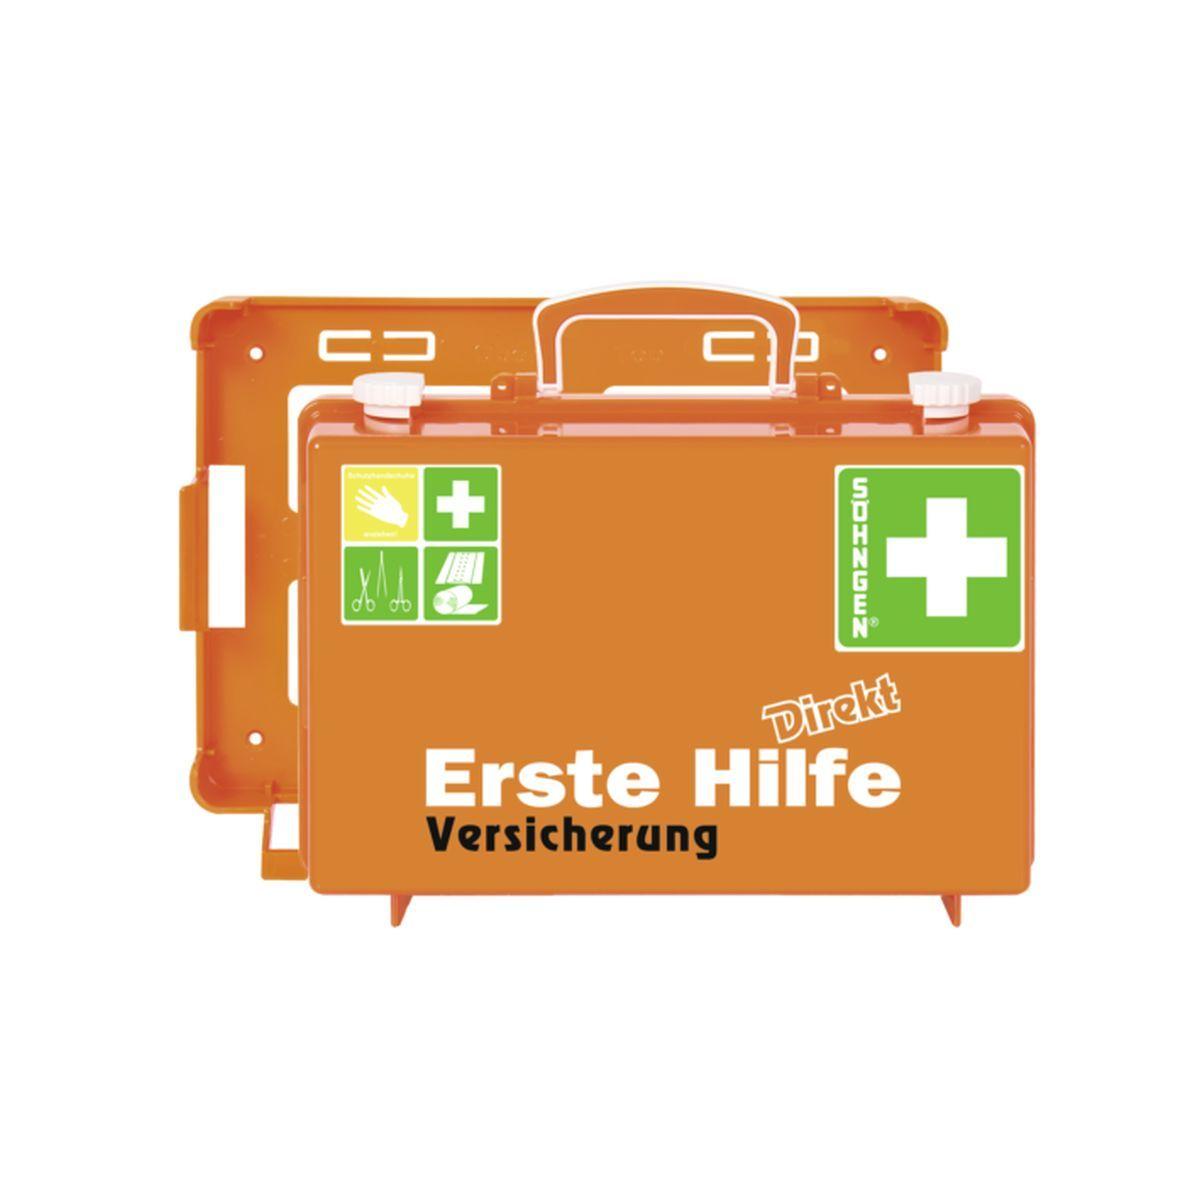 Erste Hilfe Koffer DIN 13157 DIREKT, Versicherung